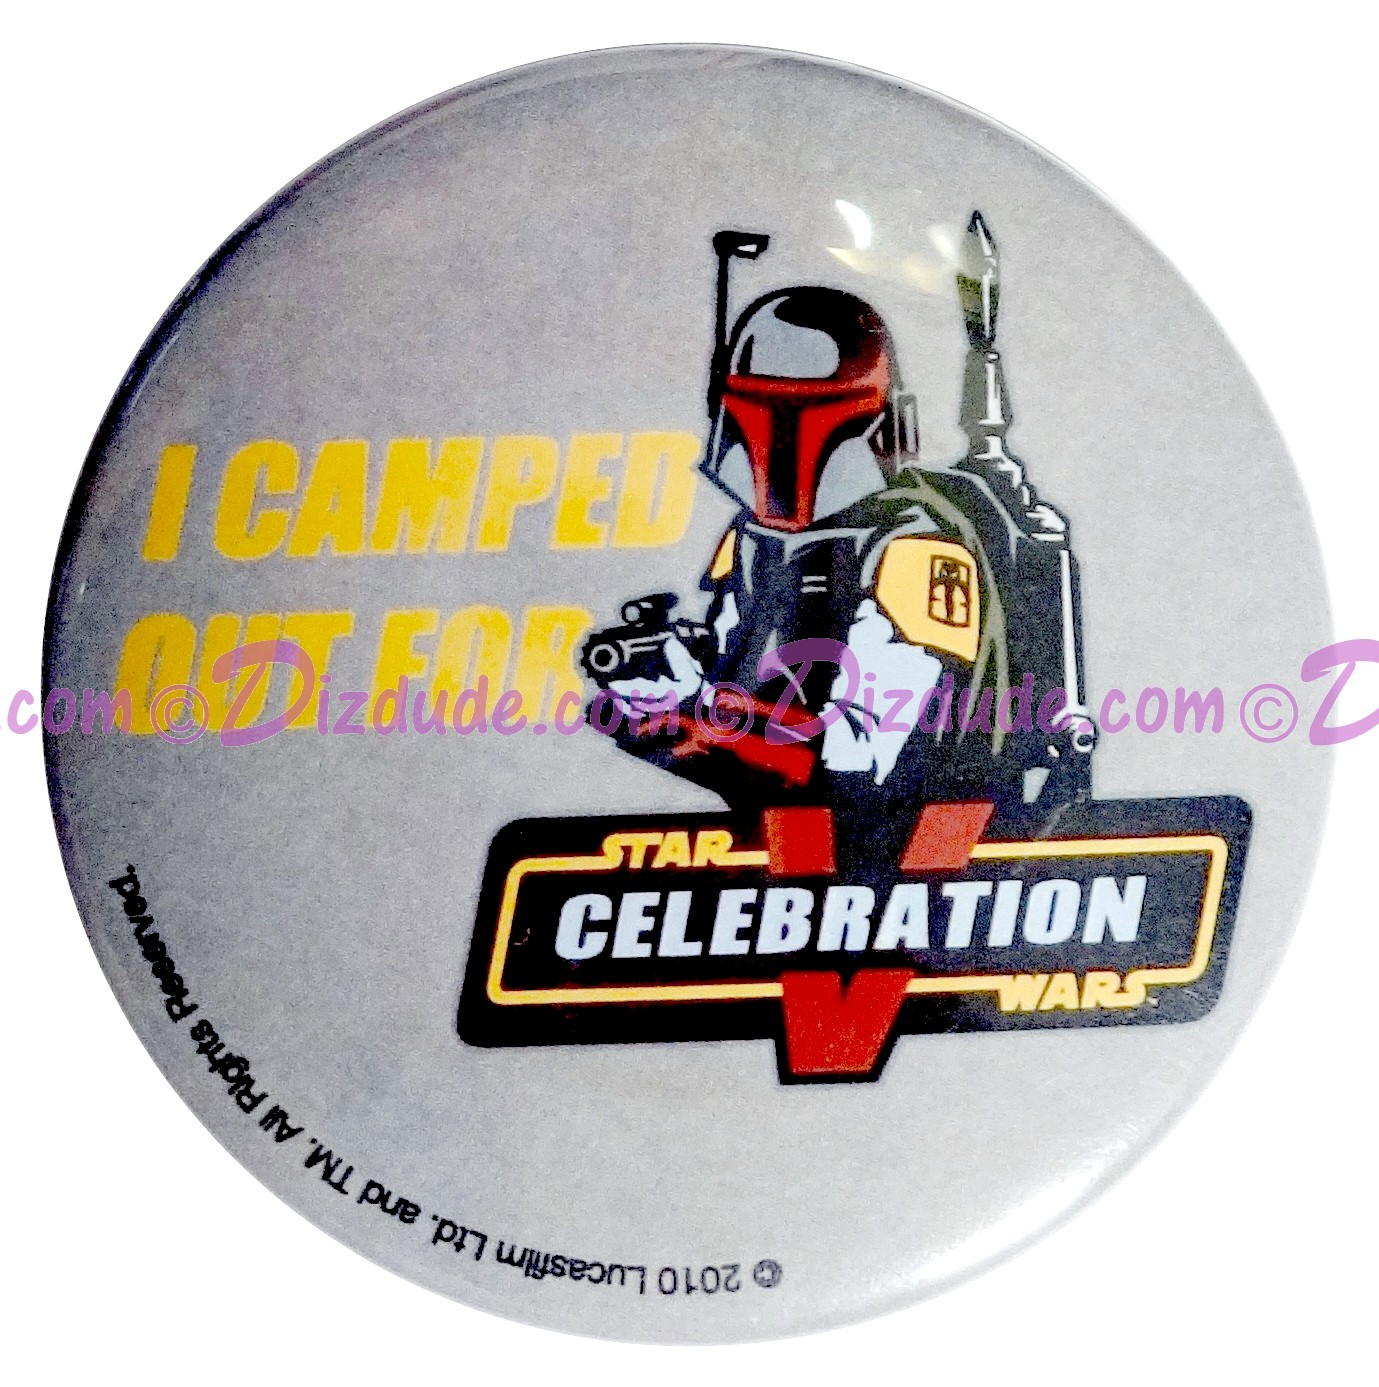 I Camped Out For STAR WARS CELEBRATION V Boba Fett Button LE 50 © Dizdude.com